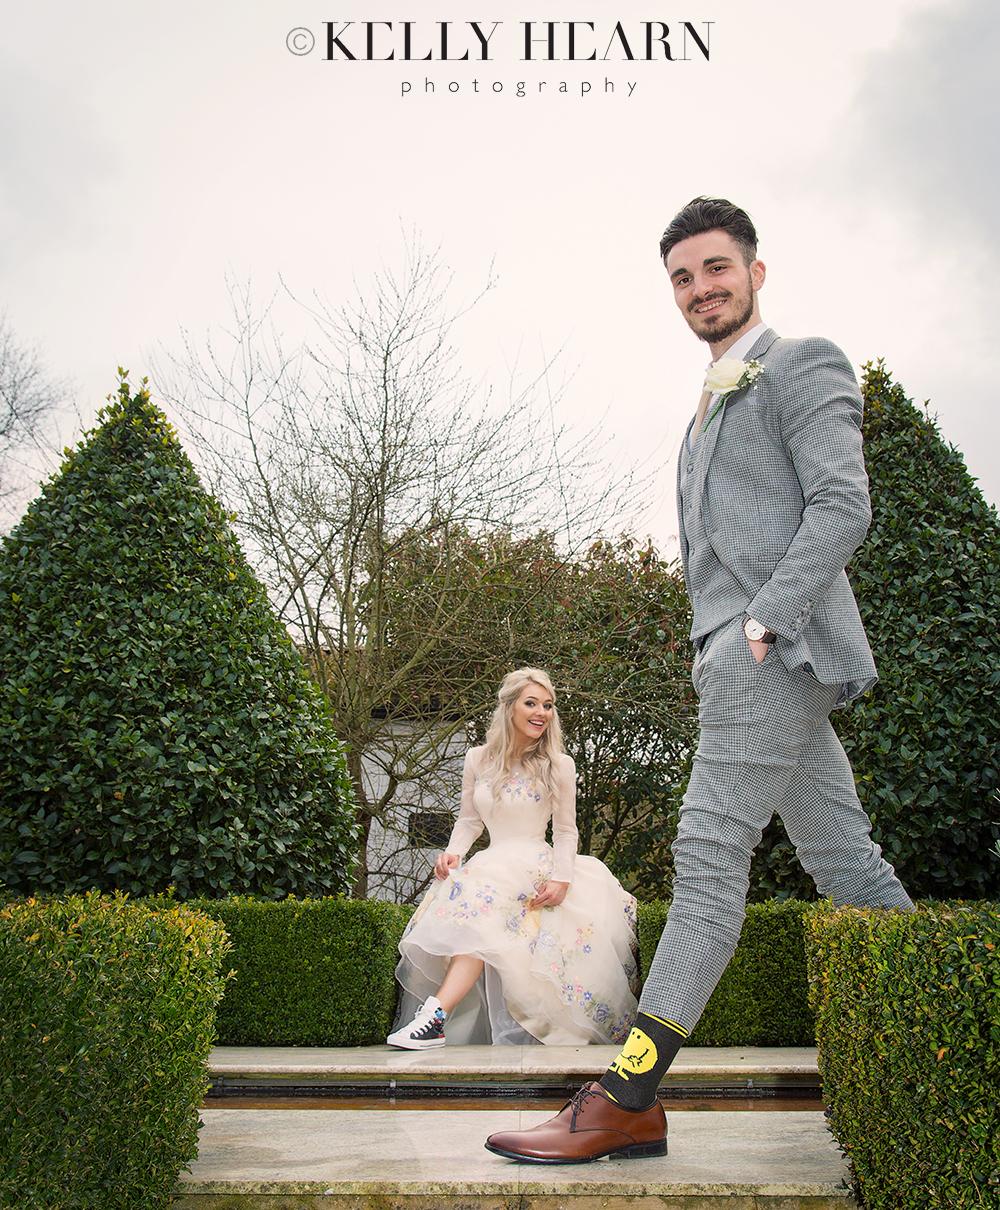 KHP_wedding-couple-humour-southend-barns.jpg#asset:2835